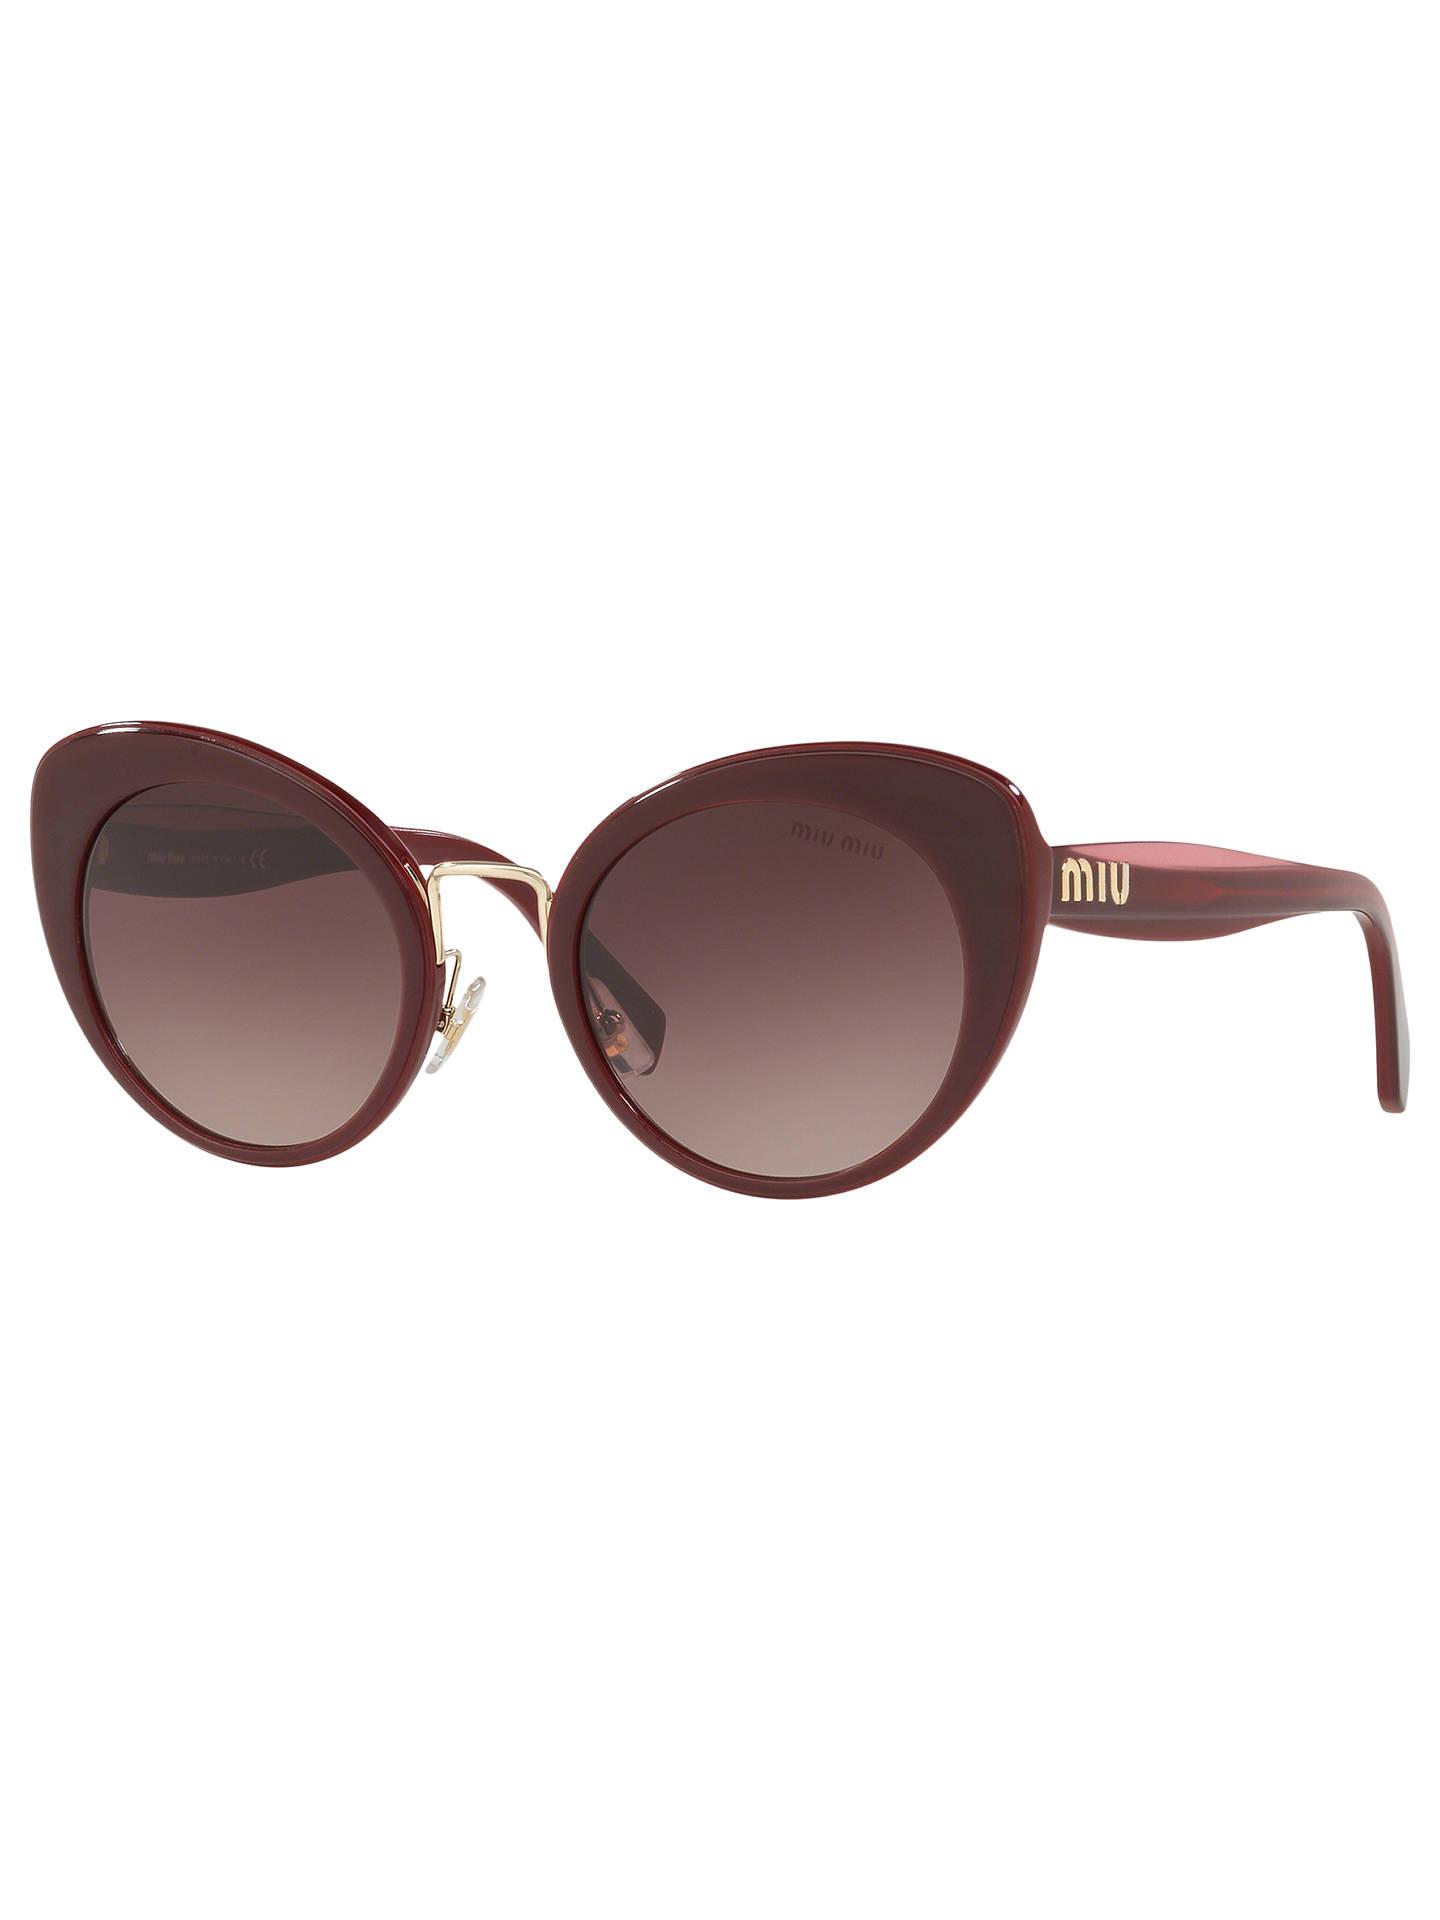 9394b7b0ac2 Buy Miu Miu MU 06TS Women s Cat s Eye Sunglasses